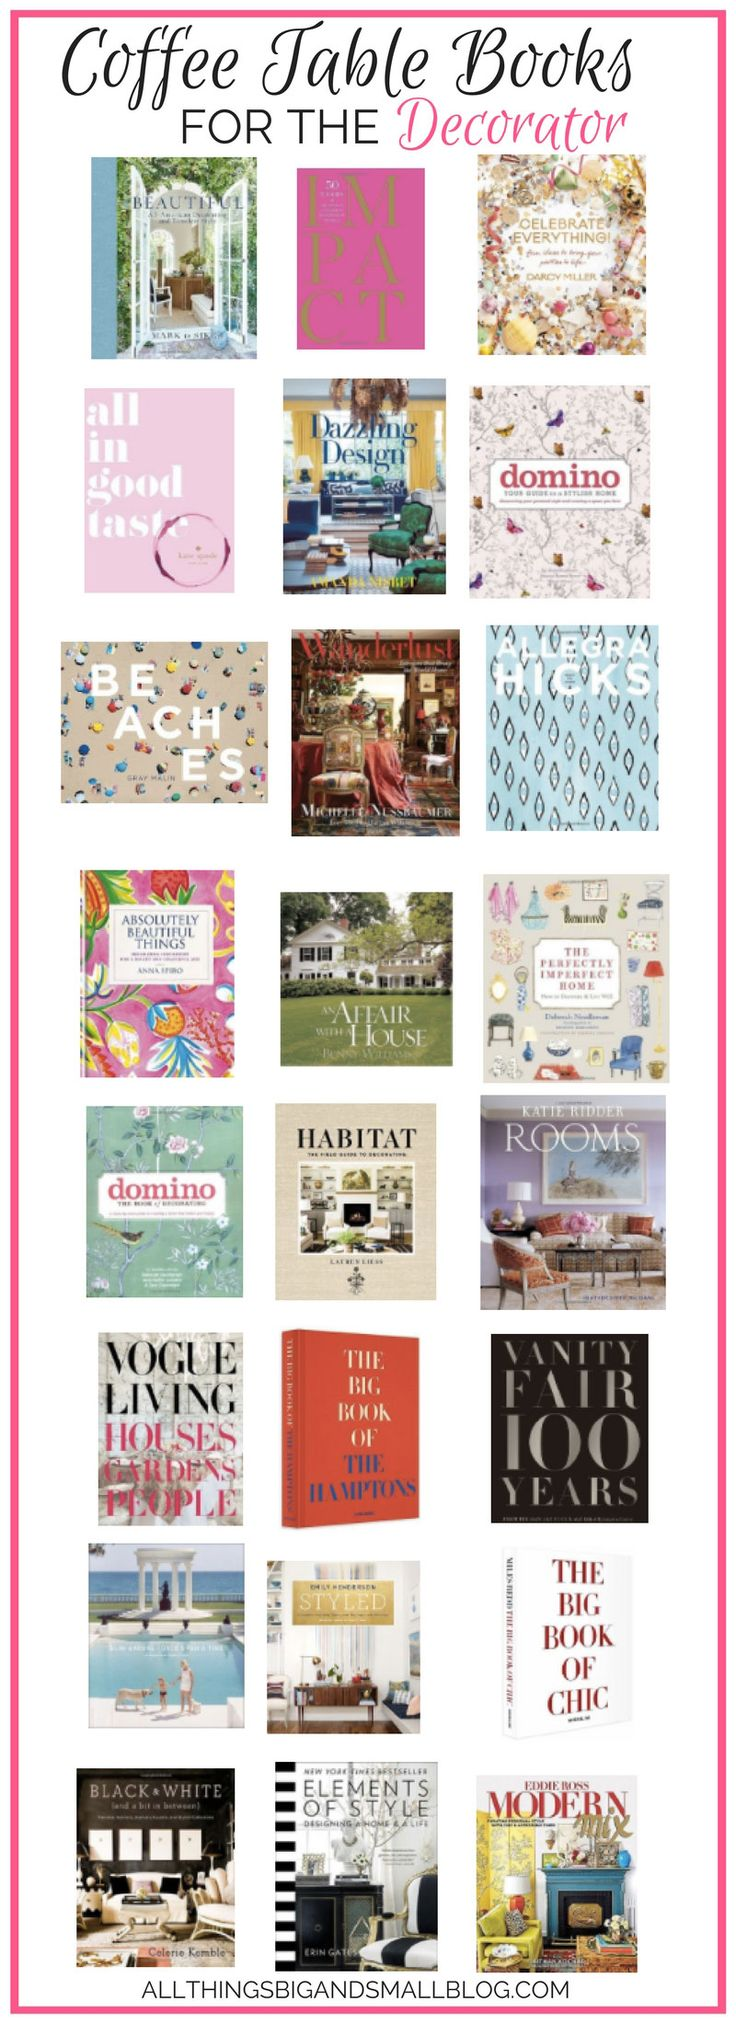 Best Coffee Table Books | Best coffee table books for decor lovers | best  interior design - 25+ Best Ideas About Coffee Table Books On Pinterest Fashion